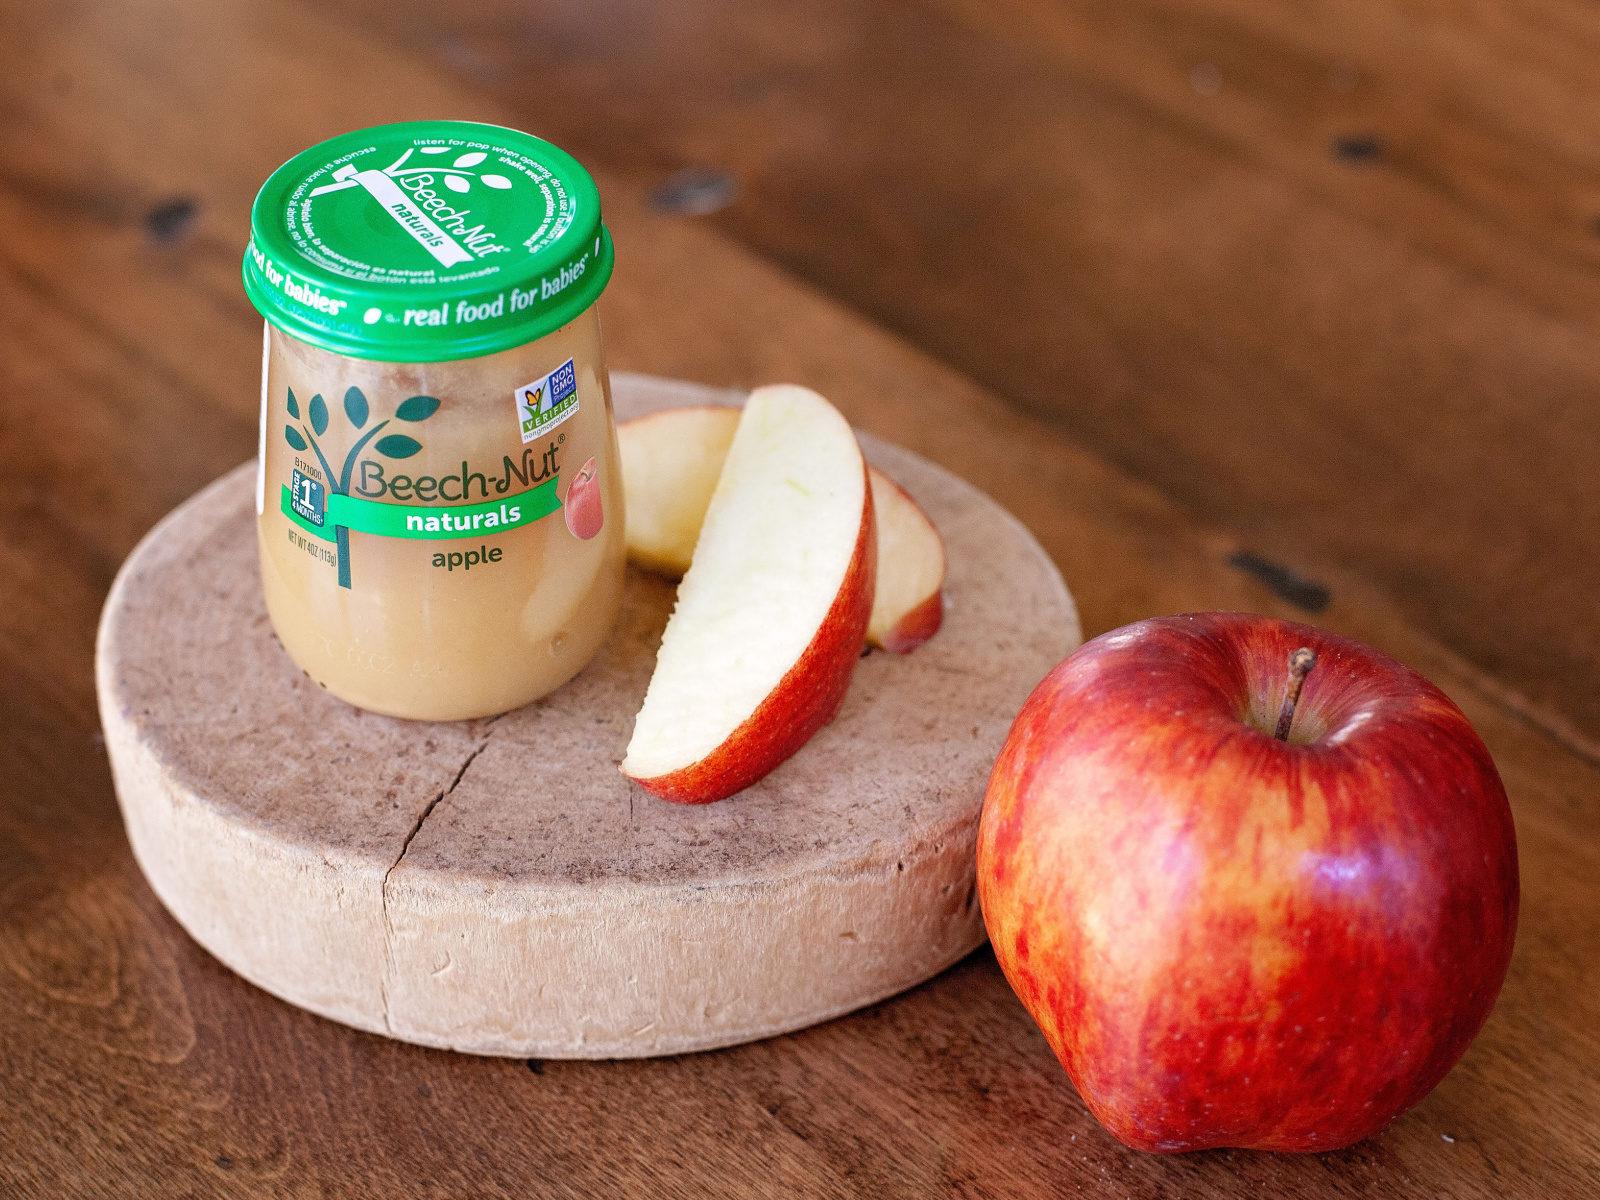 Beech-Nut Naturals Jars Just 49¢ At Publix (Half Price) on I Heart Publix